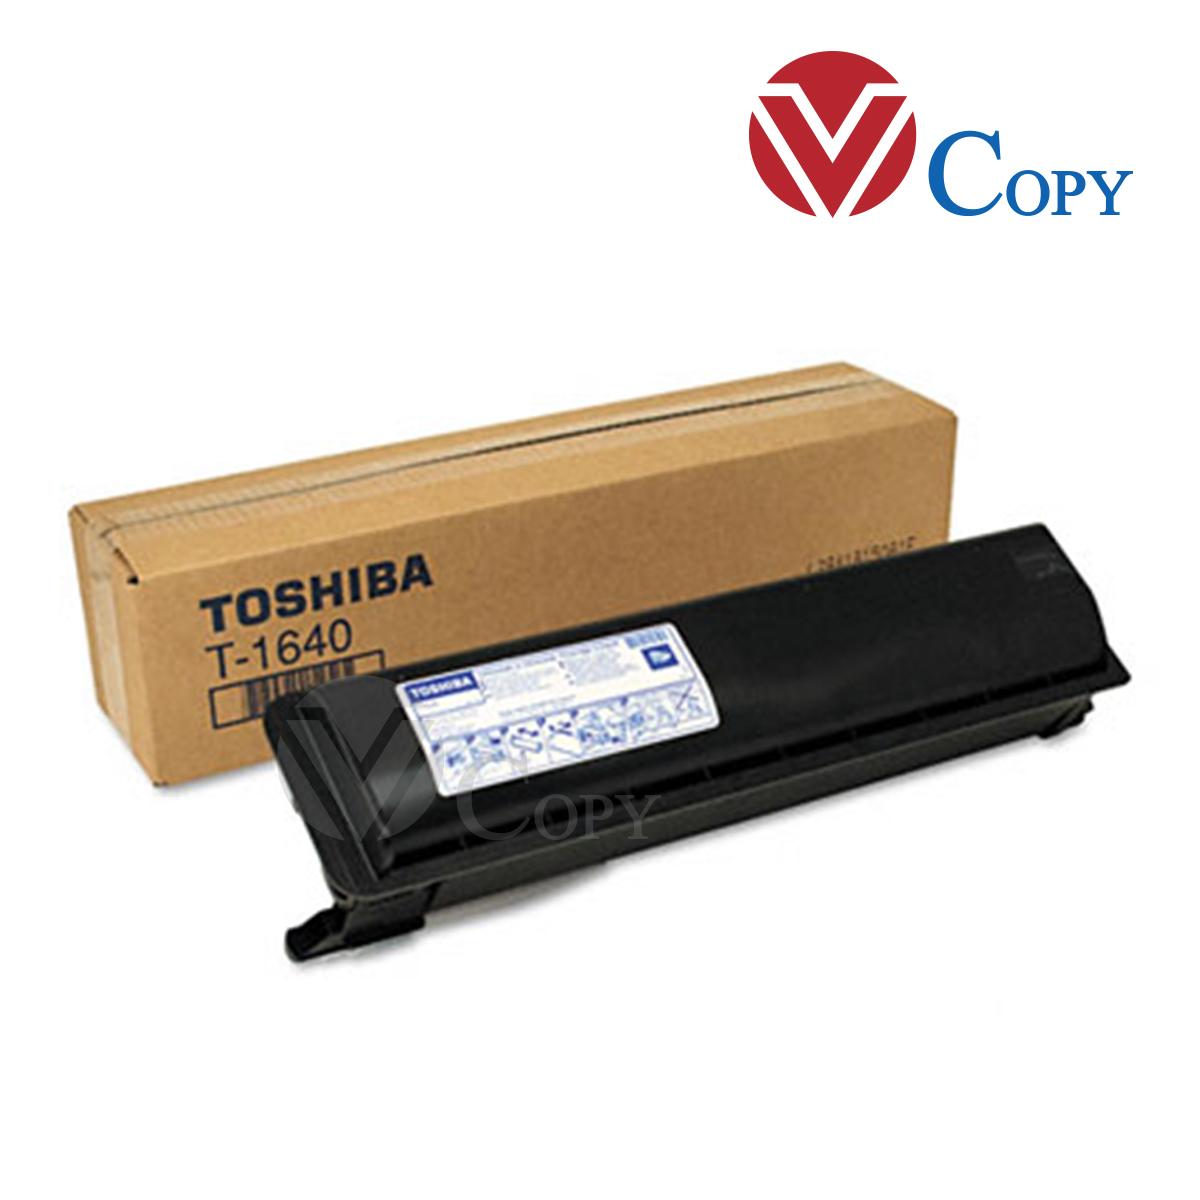 Mực Thương hiệu dùng cho máy photocopy Toshiba T1640  EStudio 163 E165 E166 E167/168/169/203/203L/205/205SE/206/207